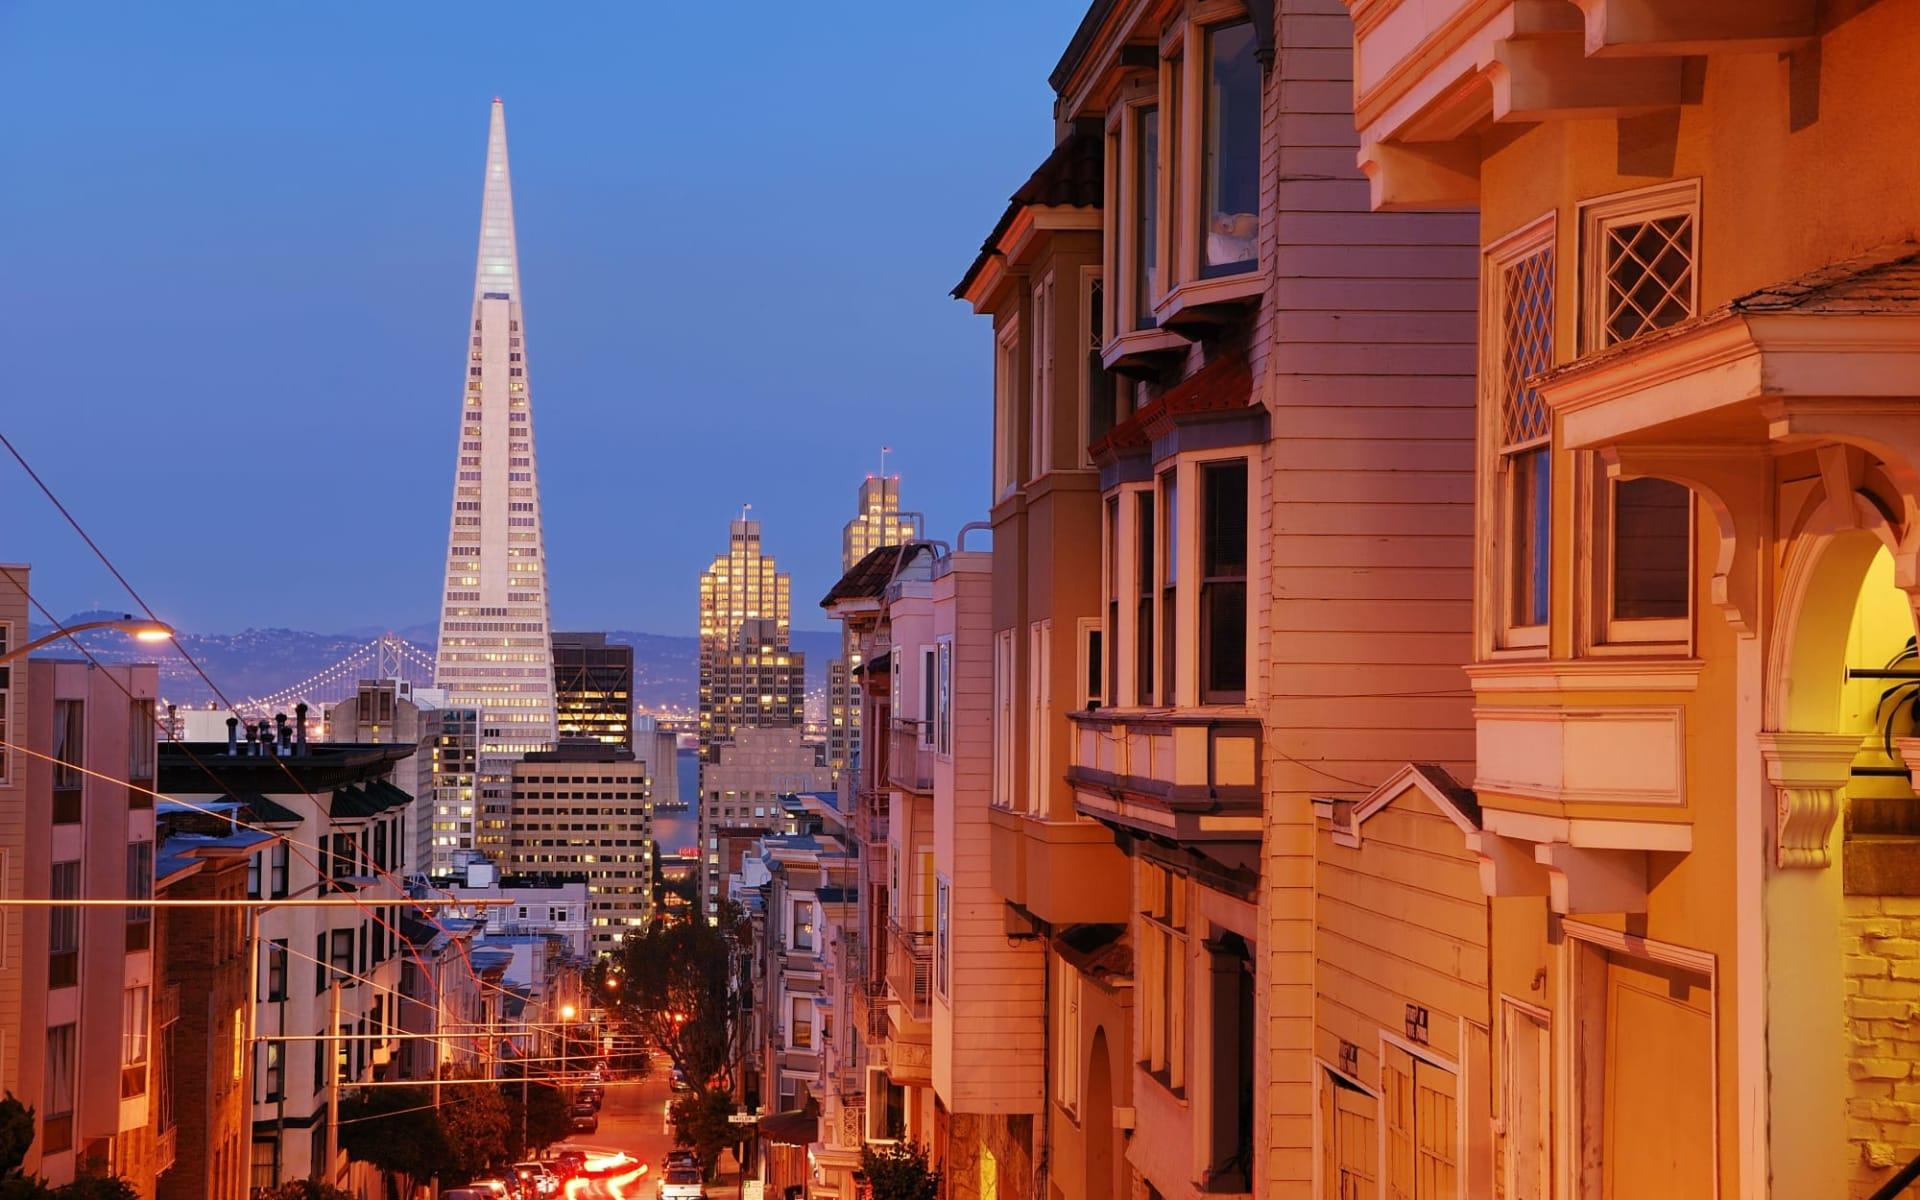 The Fairmont San Francisco Hotel: shutterstock_17119384_sanfran